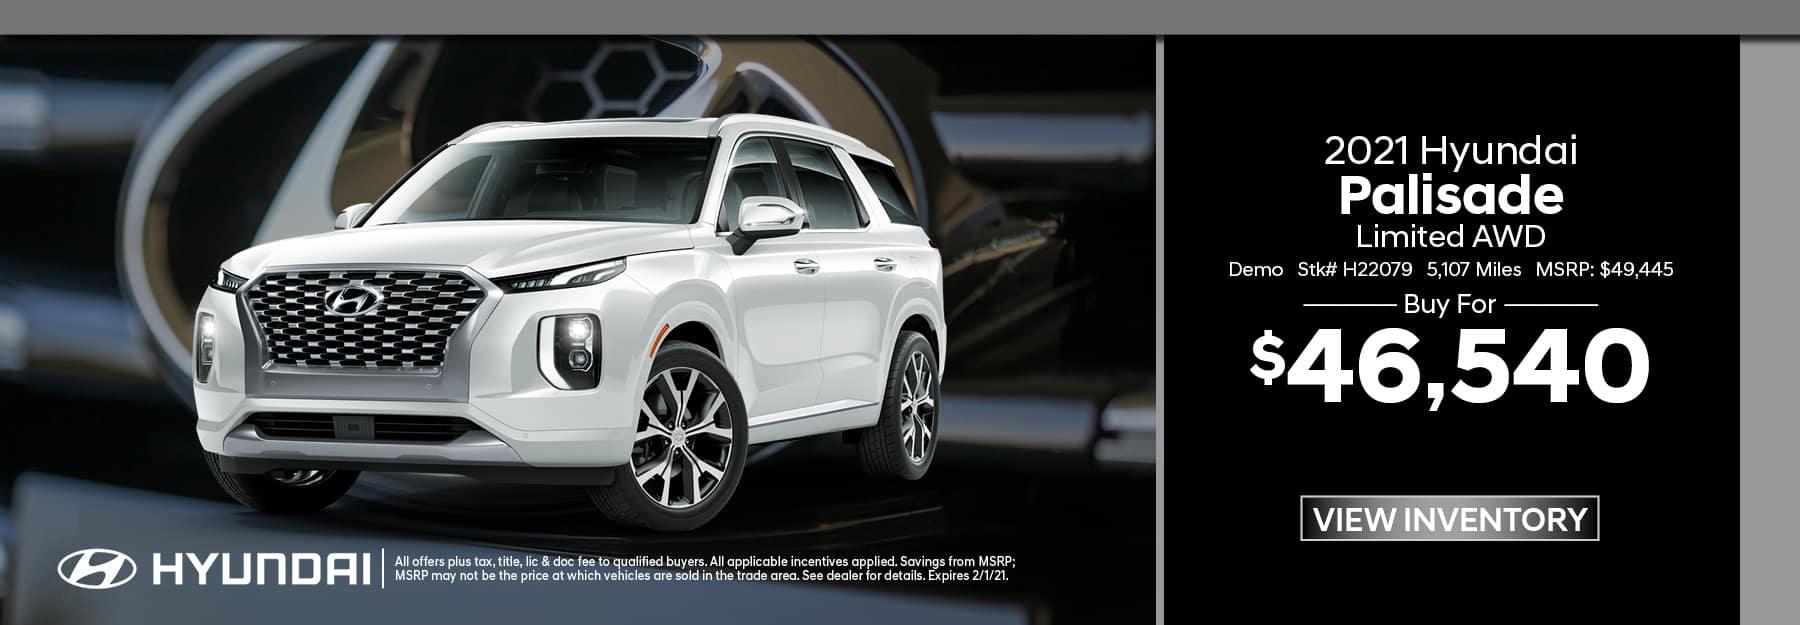 2021 Hyundai Palisade Demo